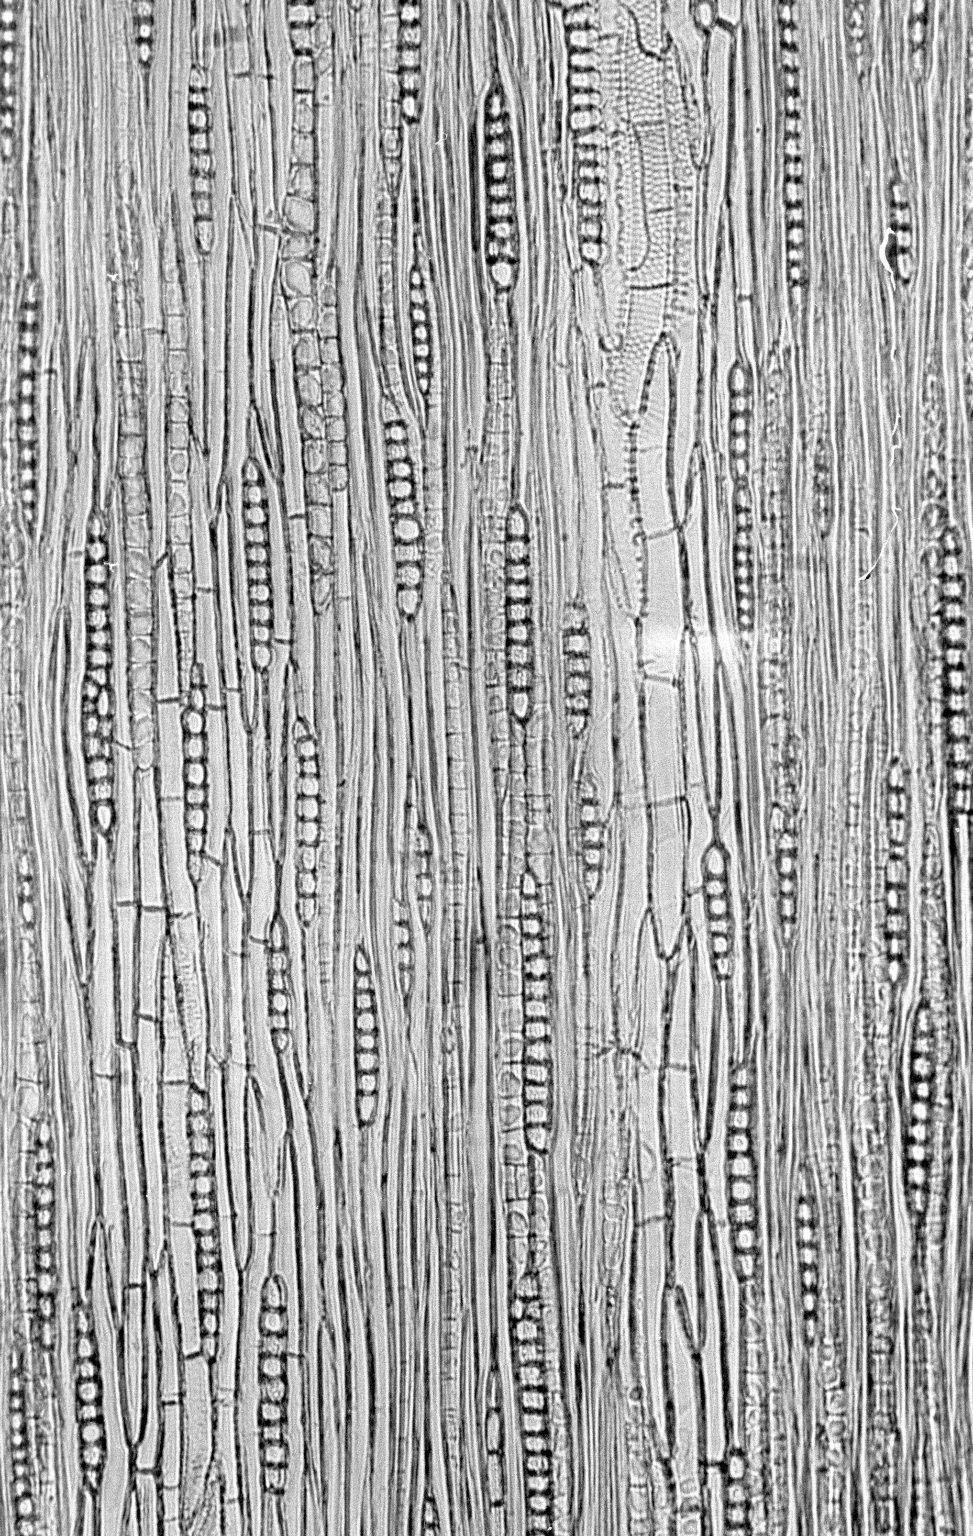 LEGUMINOSAE CAESALPINIOIDEAE Mimosoid Clade Parapiptadenia rigida